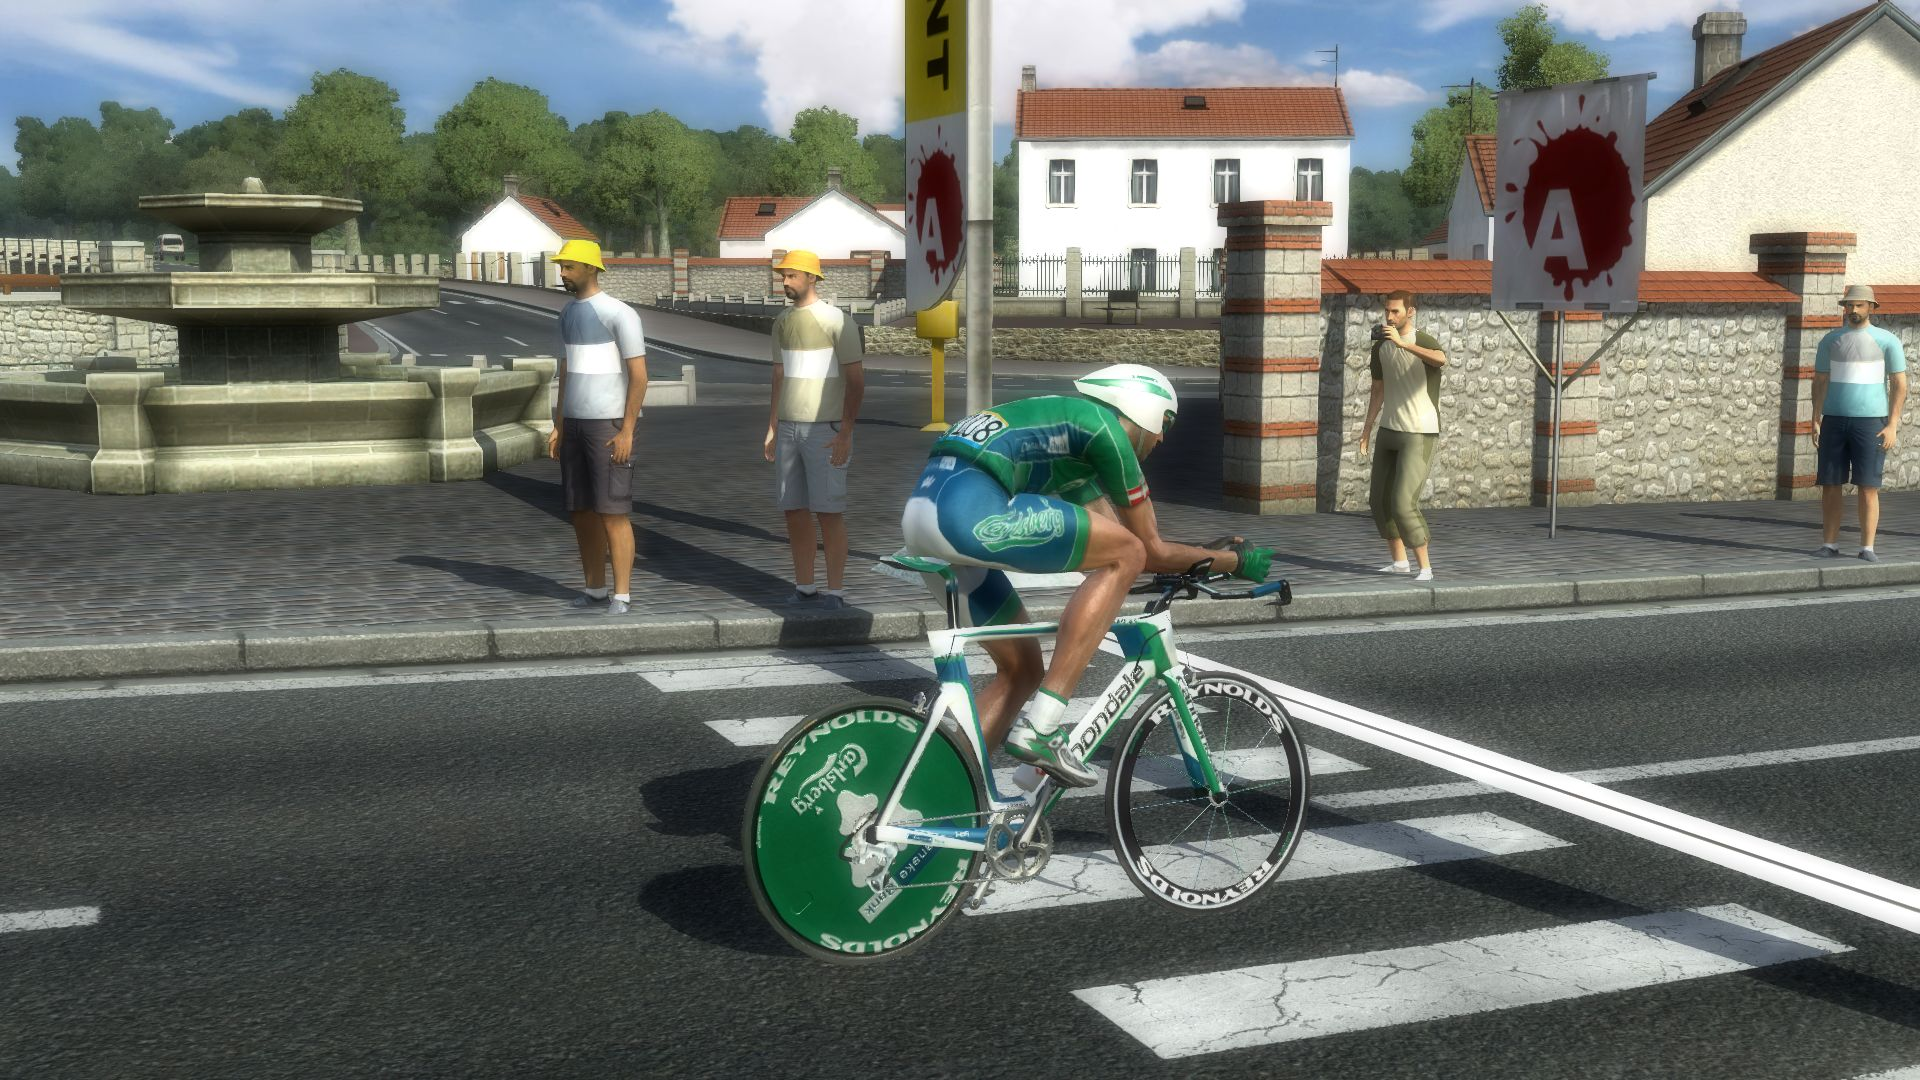 pcmdaily.com/images/mg/2019/Races/C1/Bayern/S4/mg19_bay_s04_27.jpg